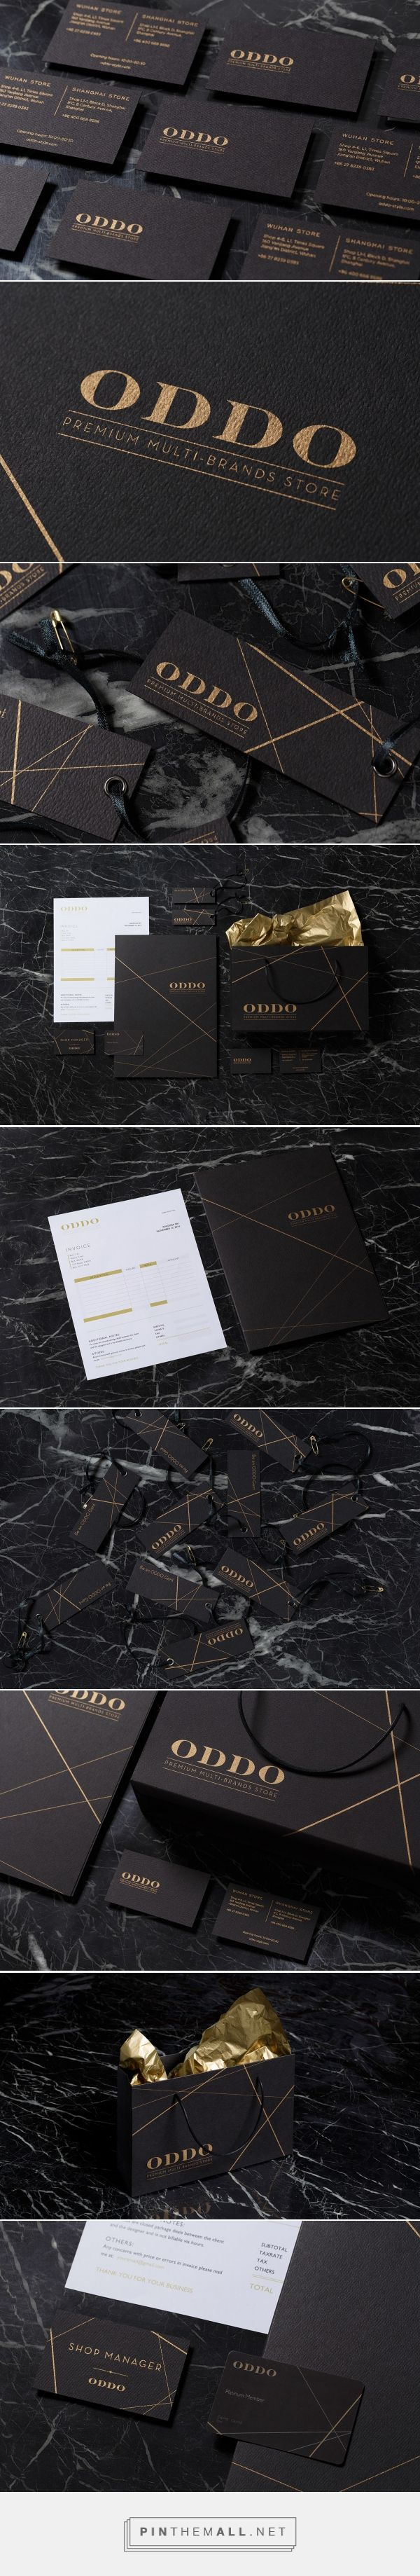 oddo fashion branding and packaging by frames. Black Bedroom Furniture Sets. Home Design Ideas